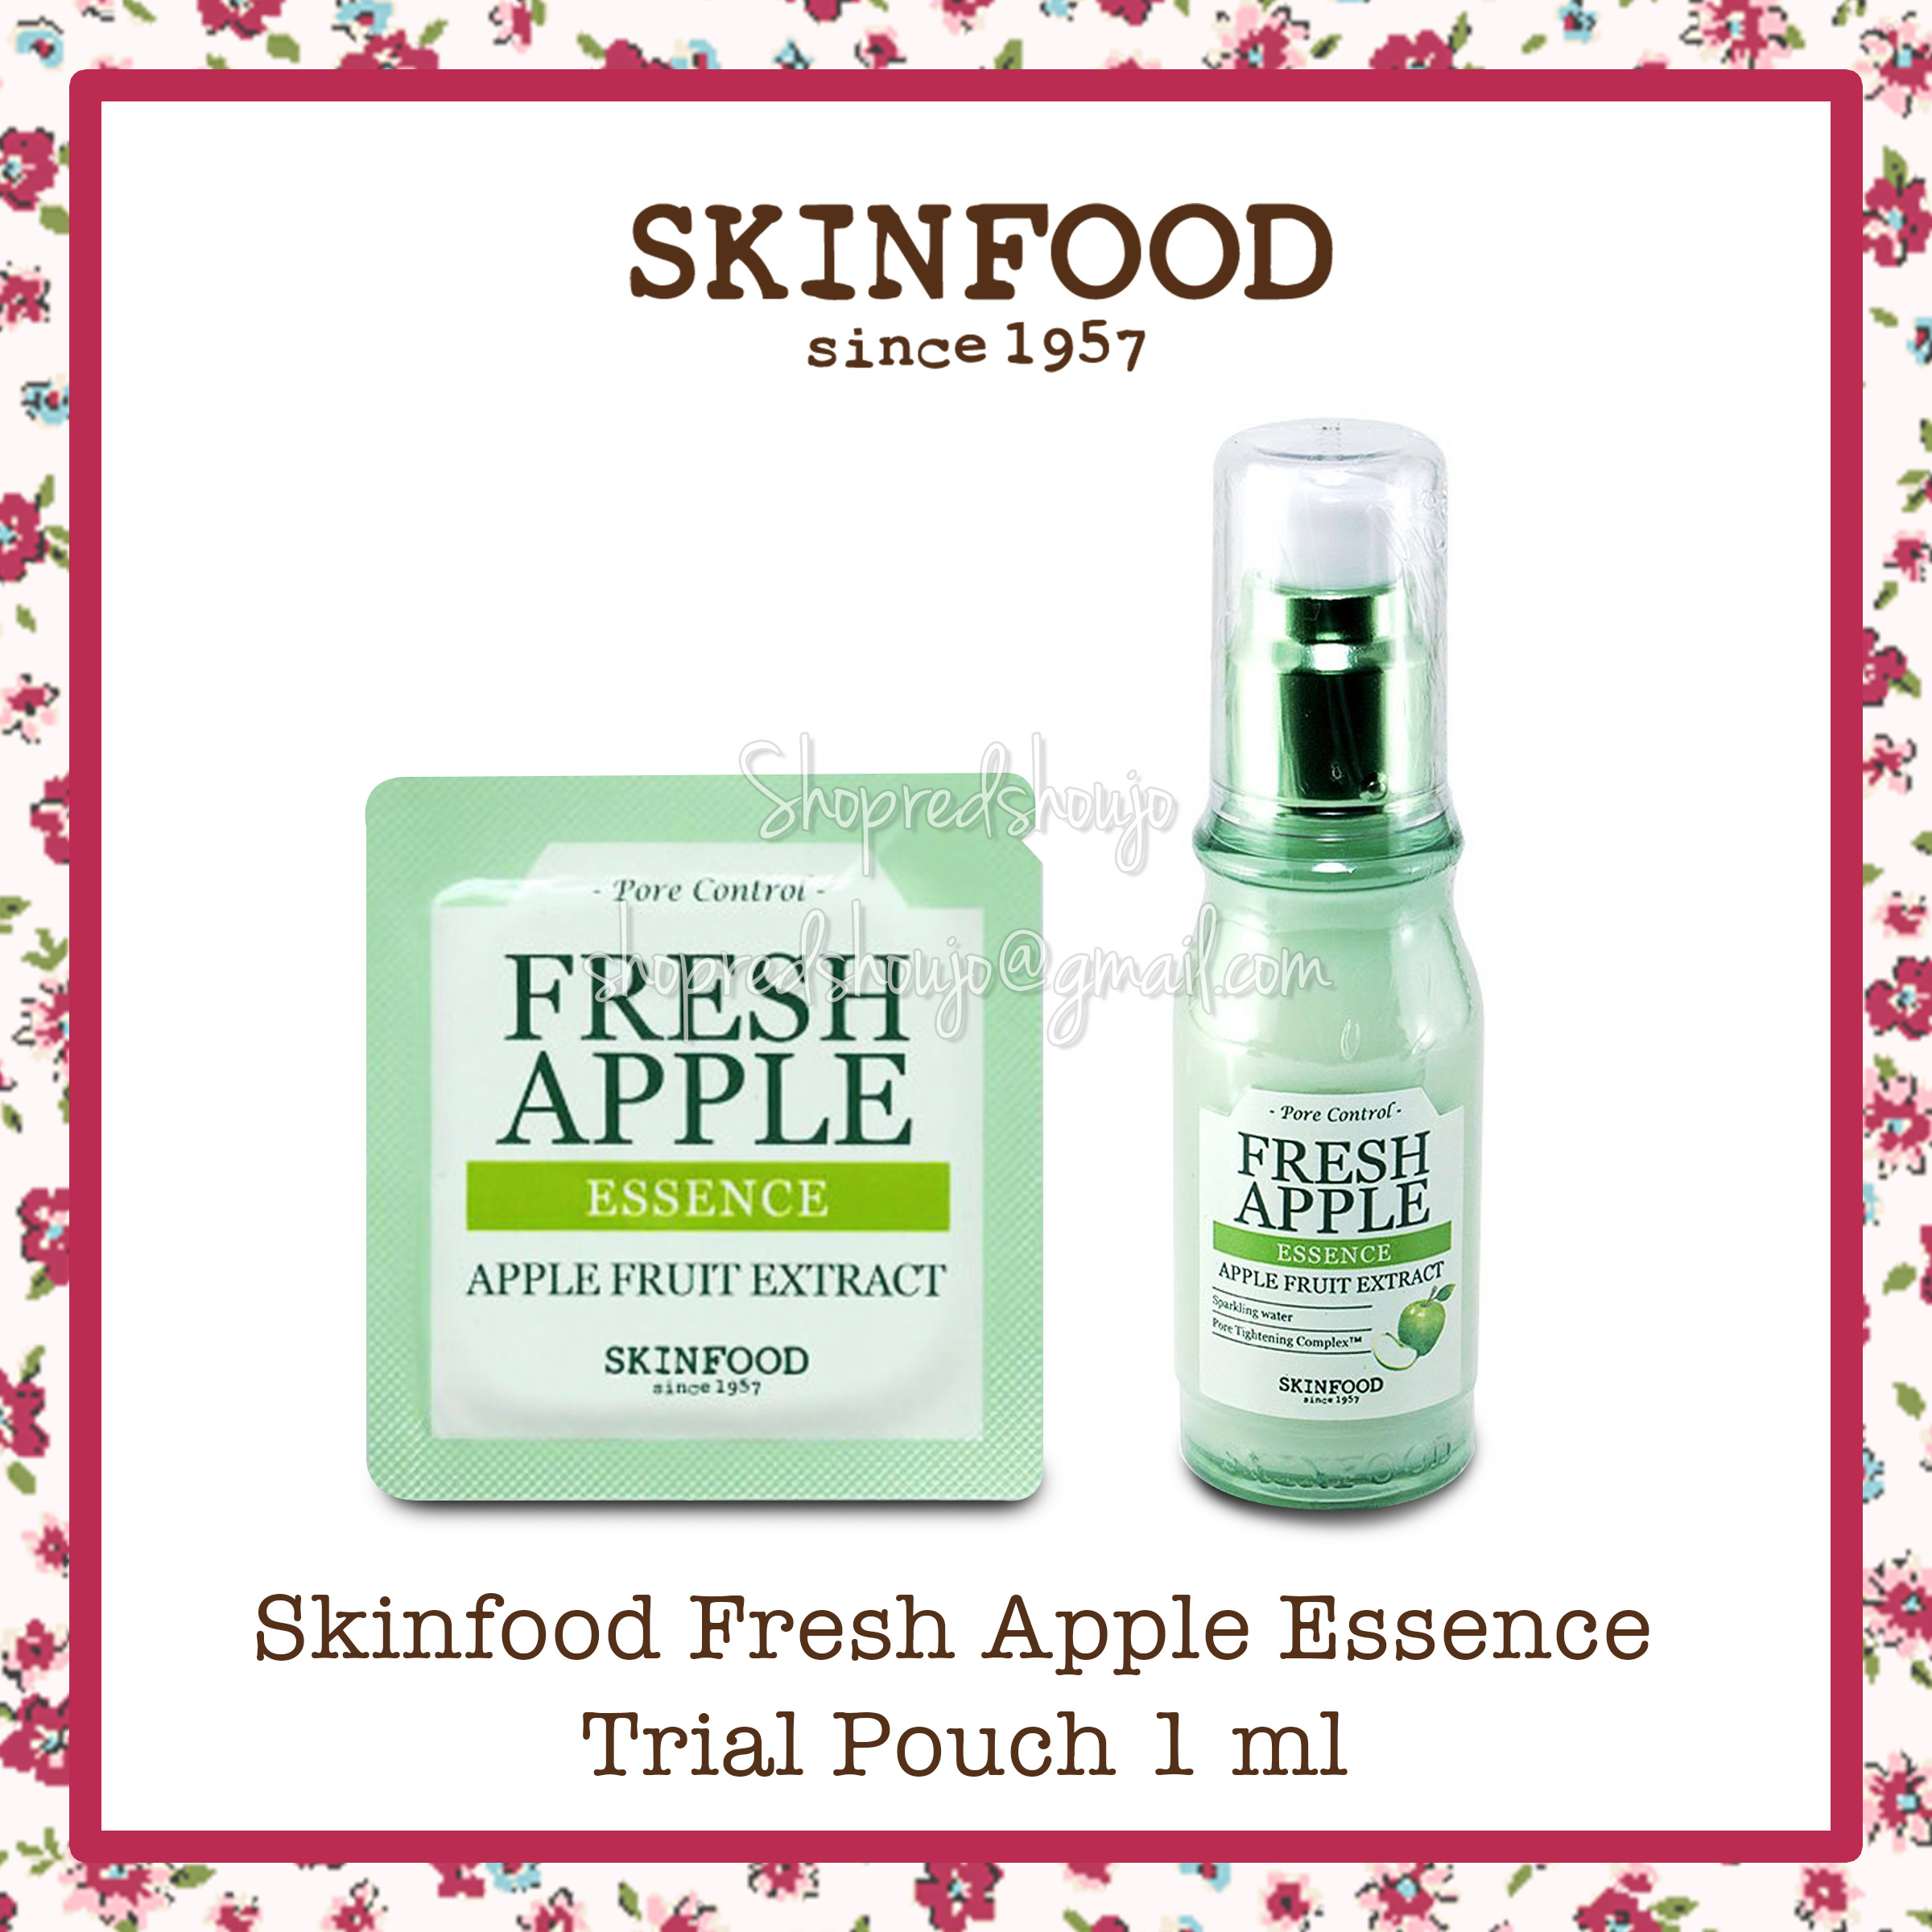 Skinfood Fresh Apple Essence Trial Pouch 1 ml